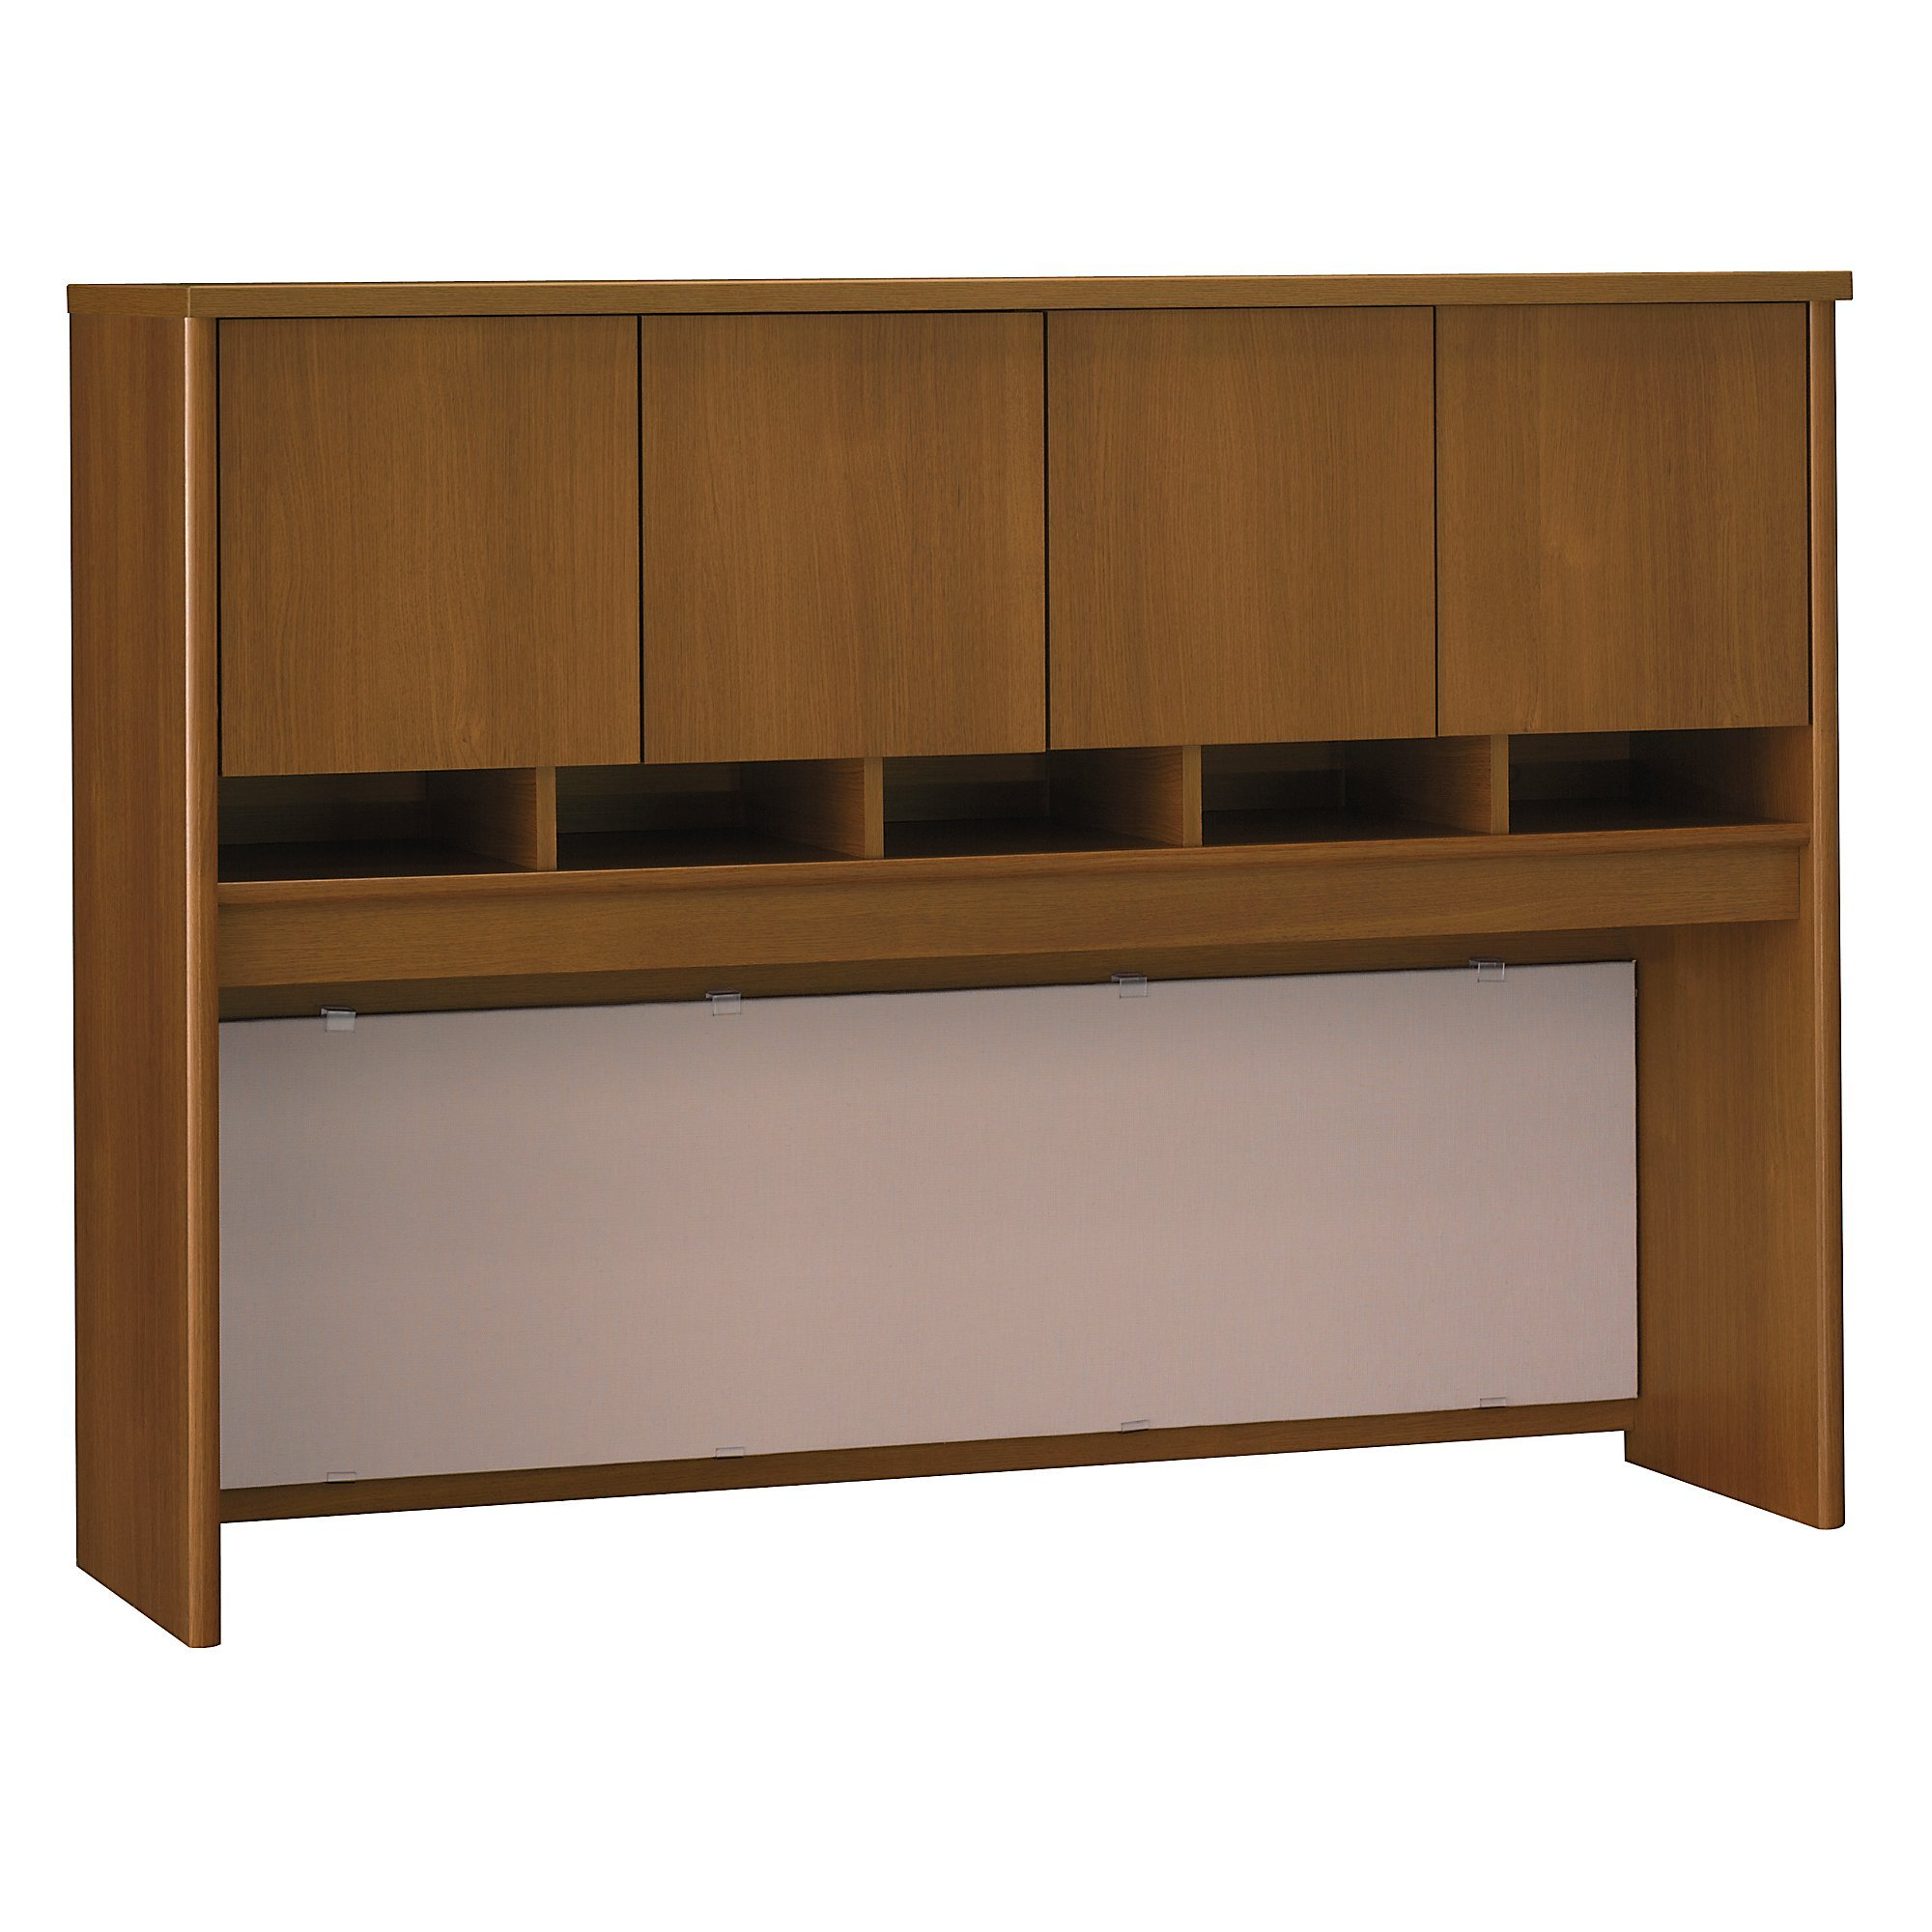 Bush Business Furniture Series C Collection 60W Hutch in Warm Oak